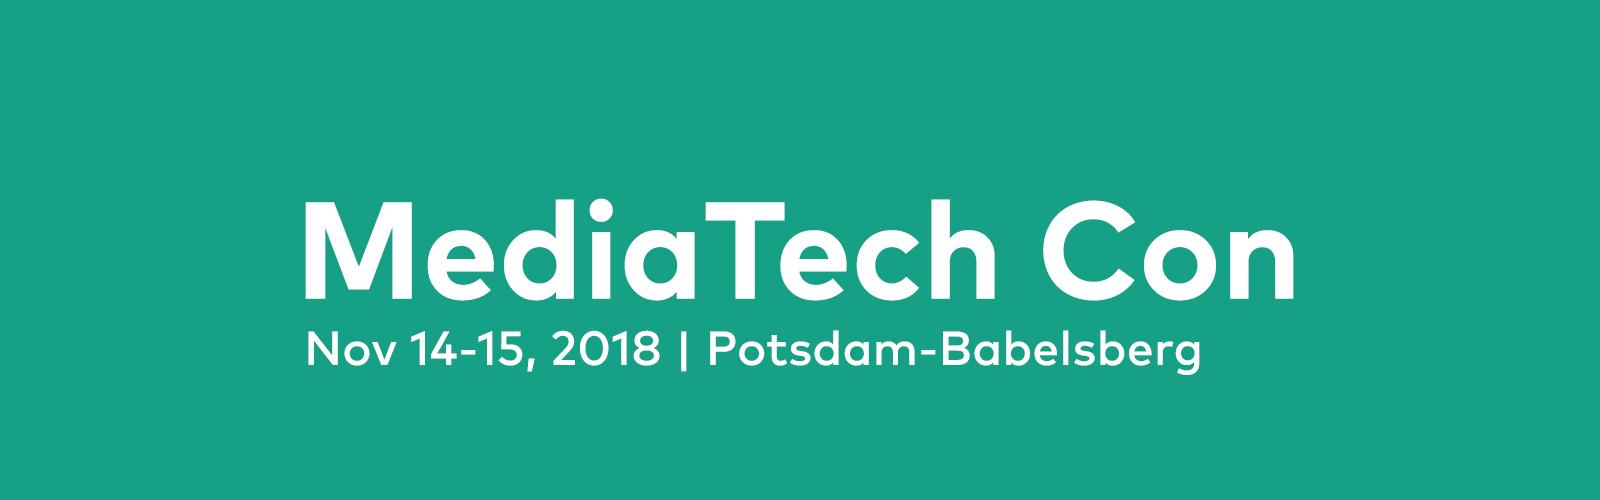 MediaTech Confernce 2018 Potsdam